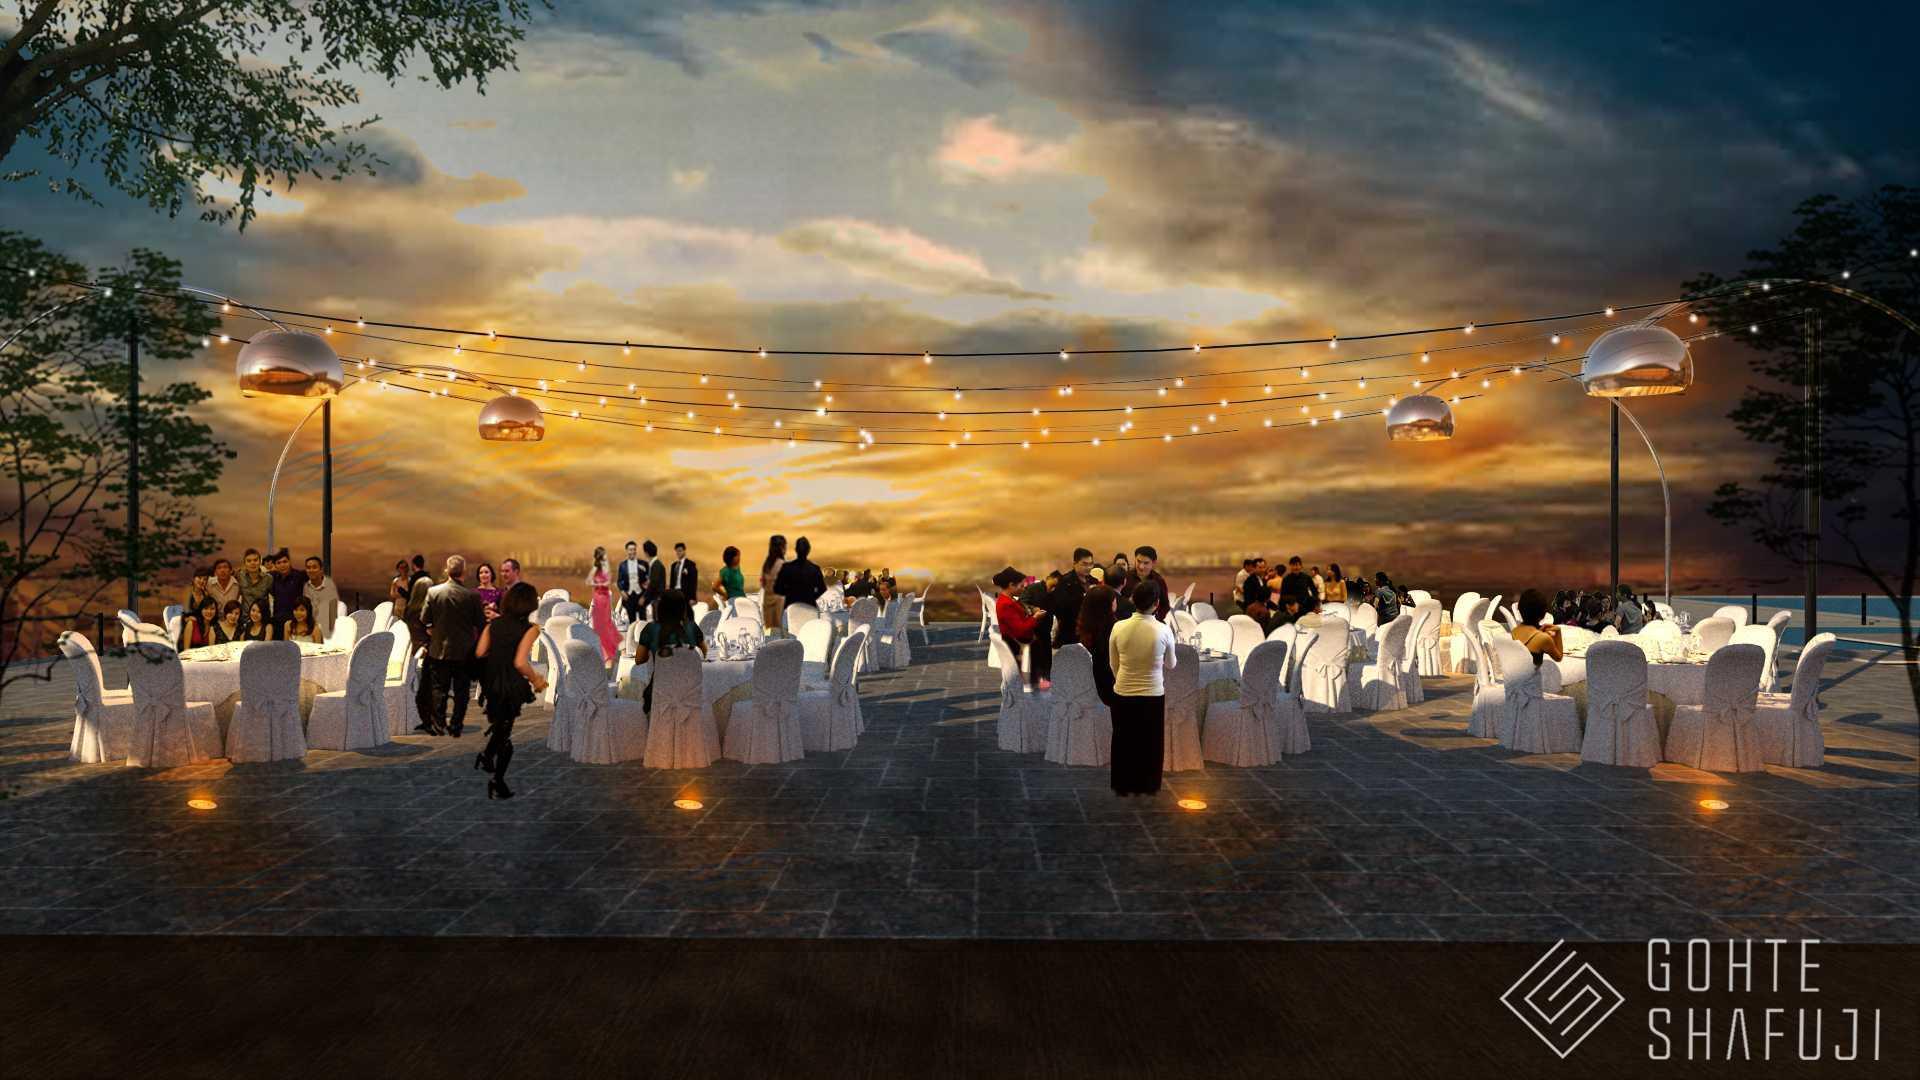 Gohte Architects Allinson Puncak Resort Cisarua, Kec. Cisarua, Kabupaten Bandung Barat, Jawa Barat, Indonesia Cisarua, Kec. Cisarua, Kabupaten Bandung Barat, Jawa Barat, Indonesia Gohte-Architects-Allinson-Puncak-Resort   96682